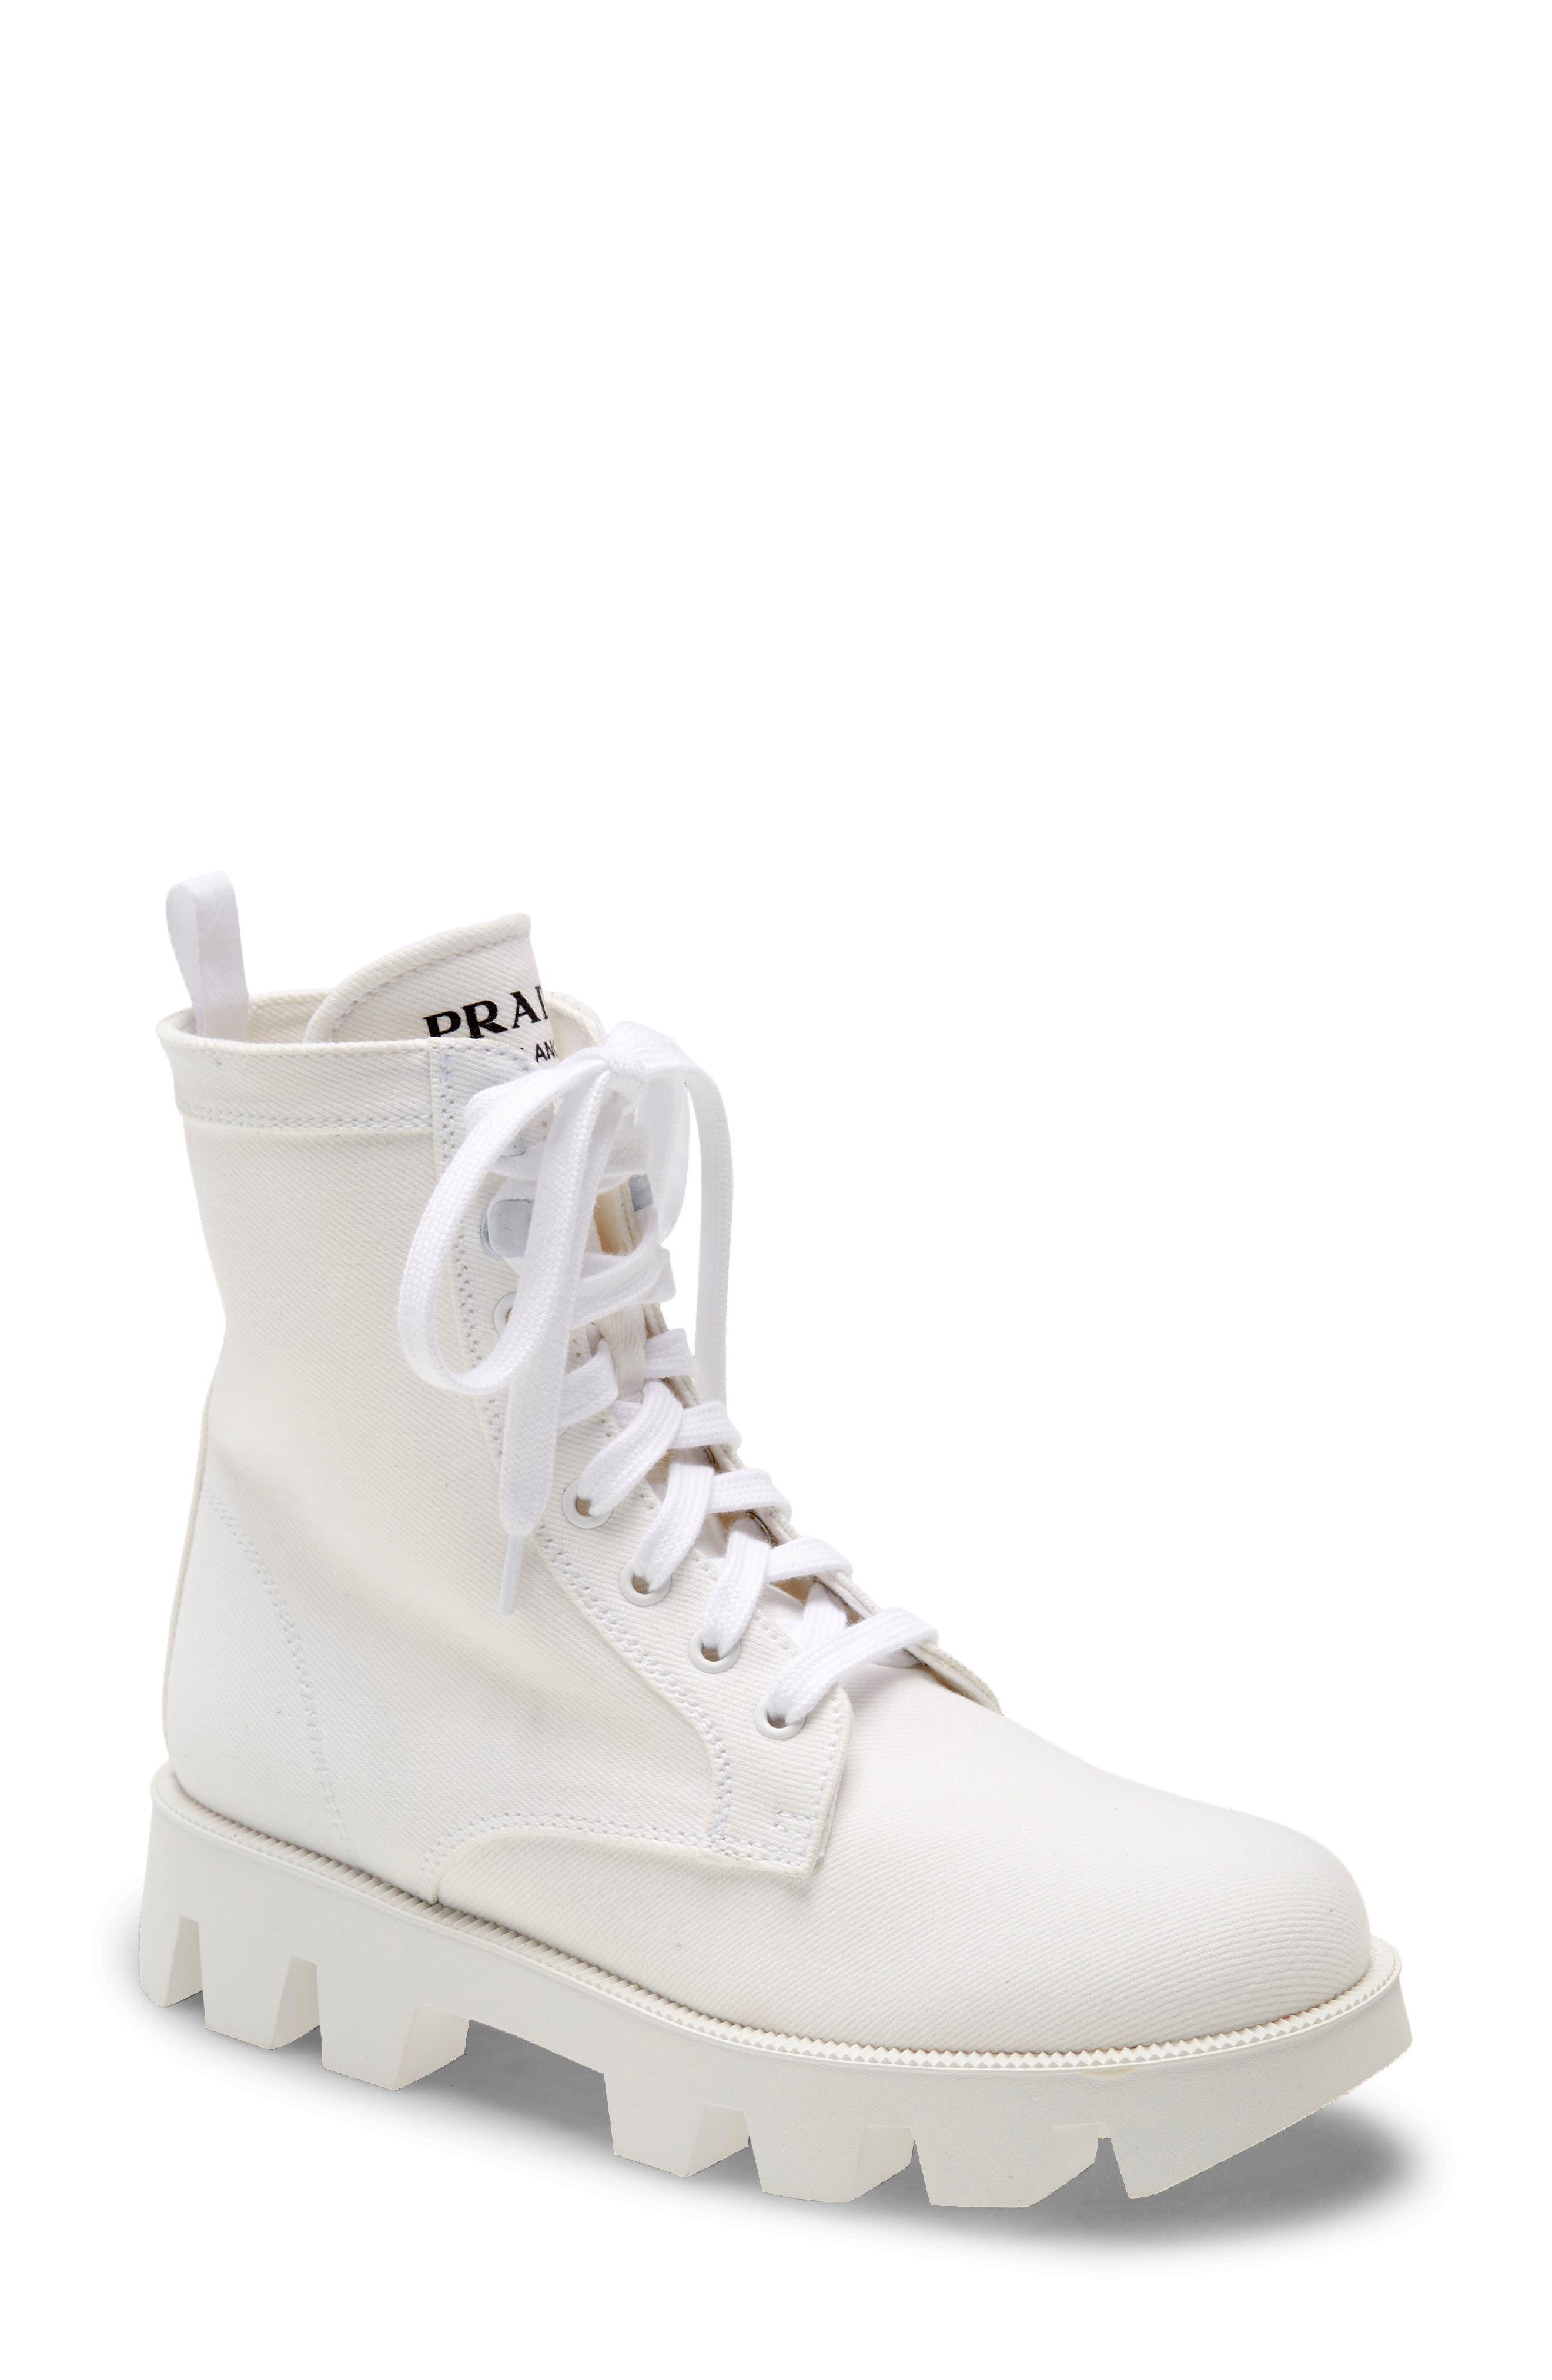 Women's White Boots   Nordstrom